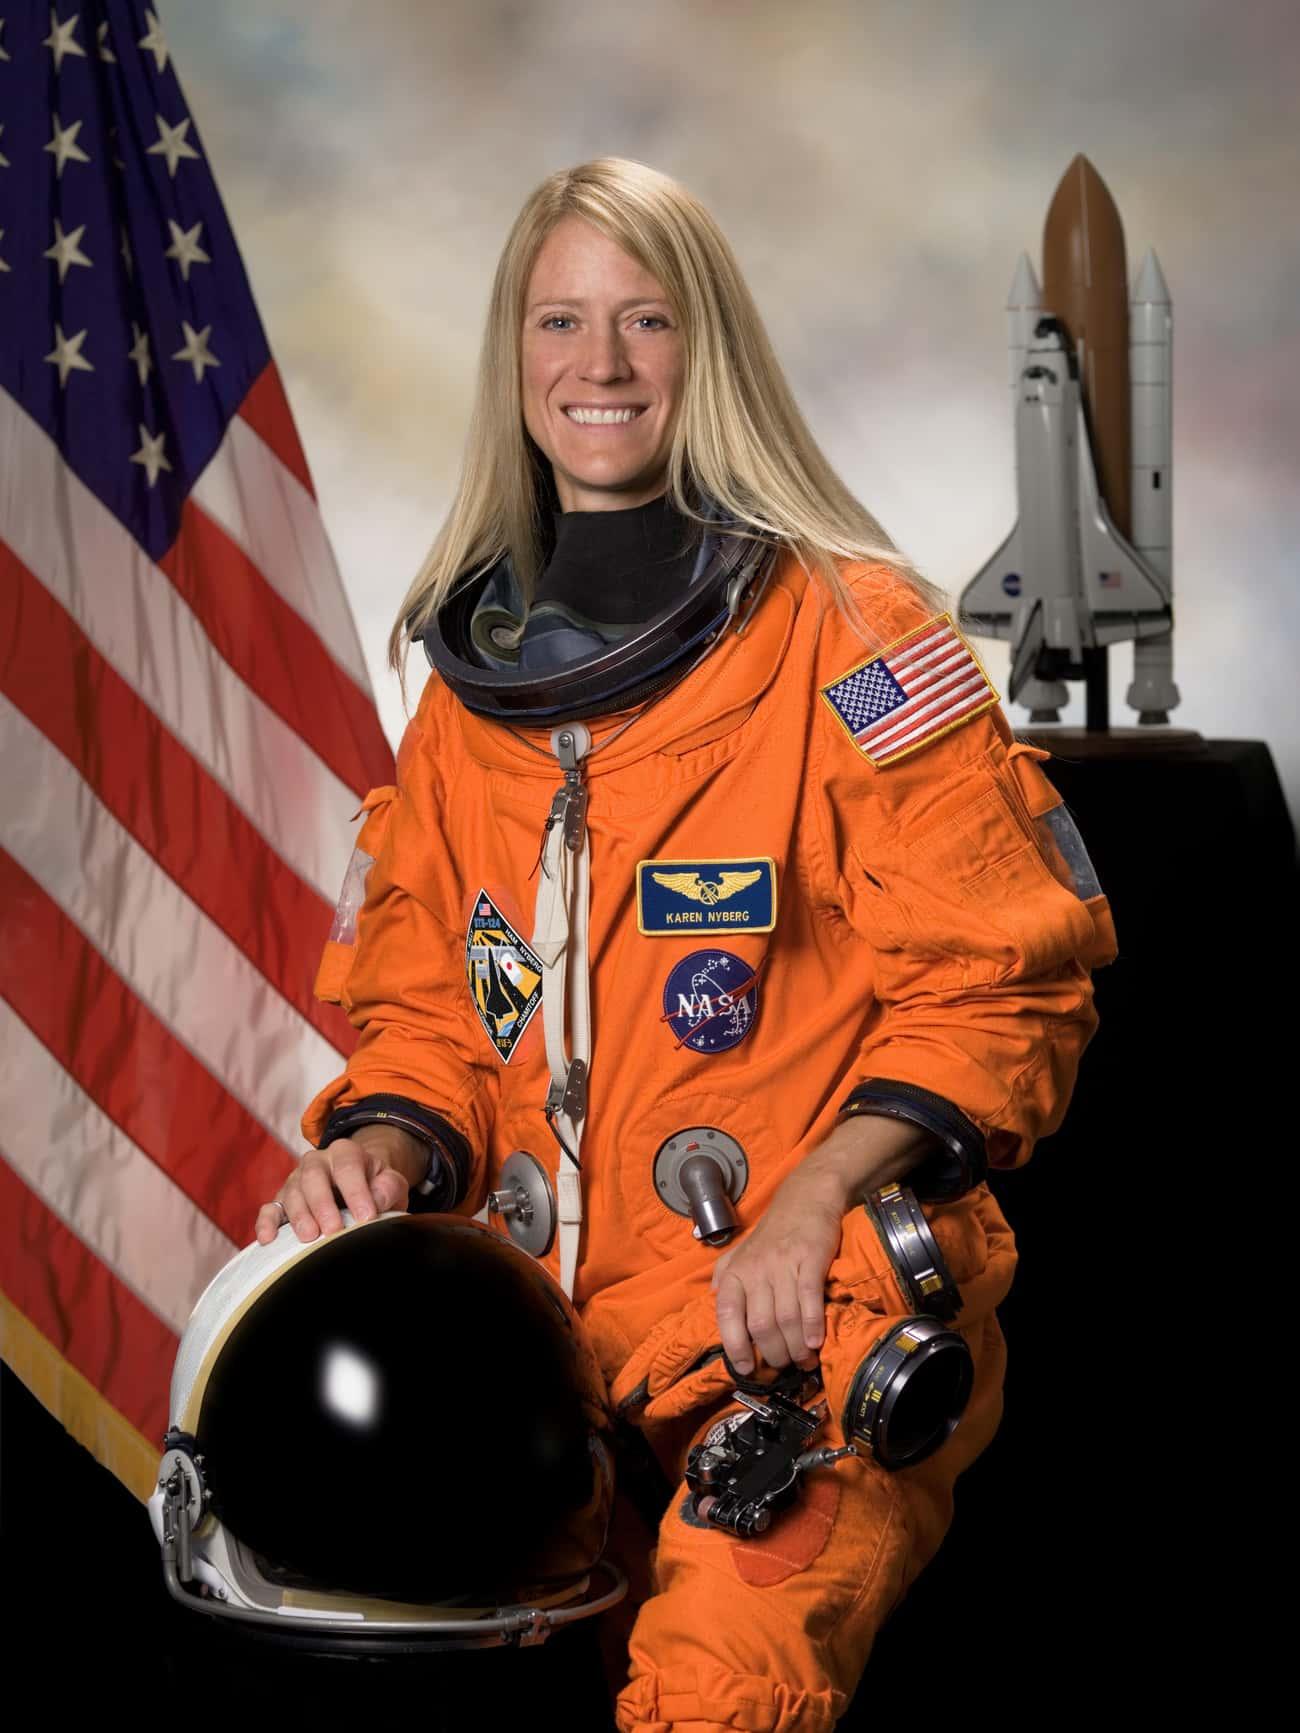 Karen L. Nyberg